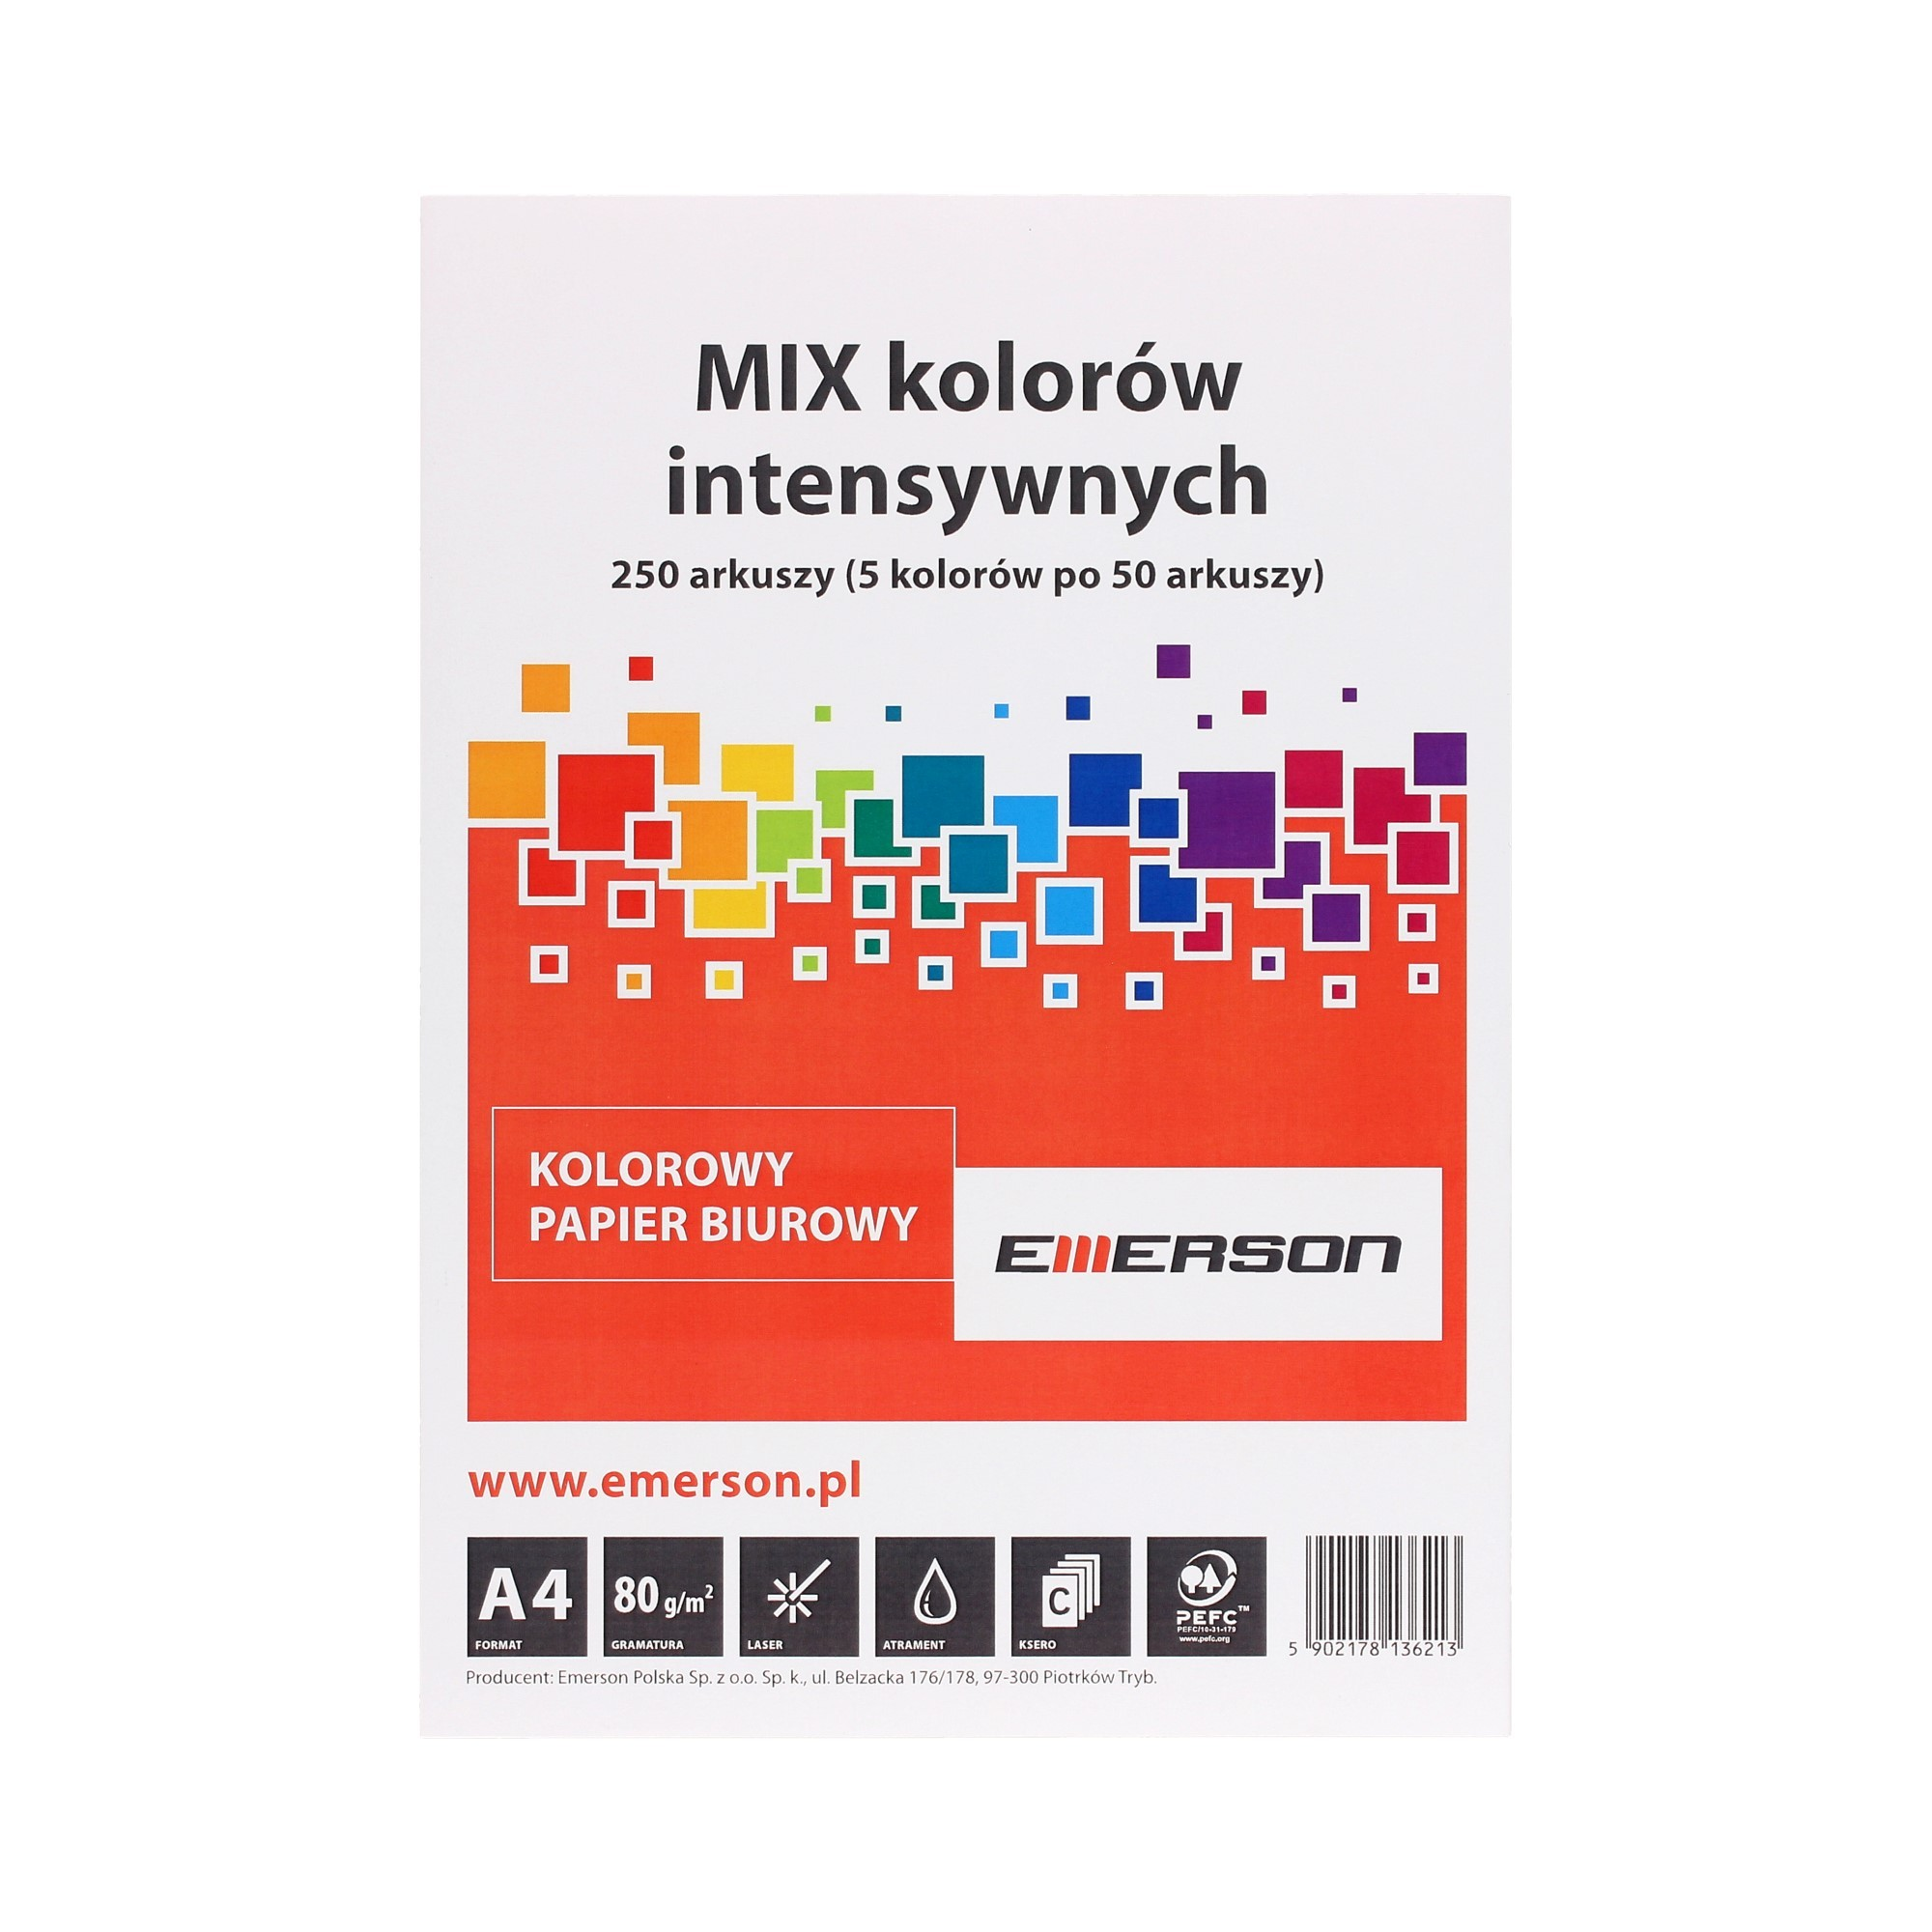 Papier ksero A4 80g mix kolorów intensywnych Emerson (250)